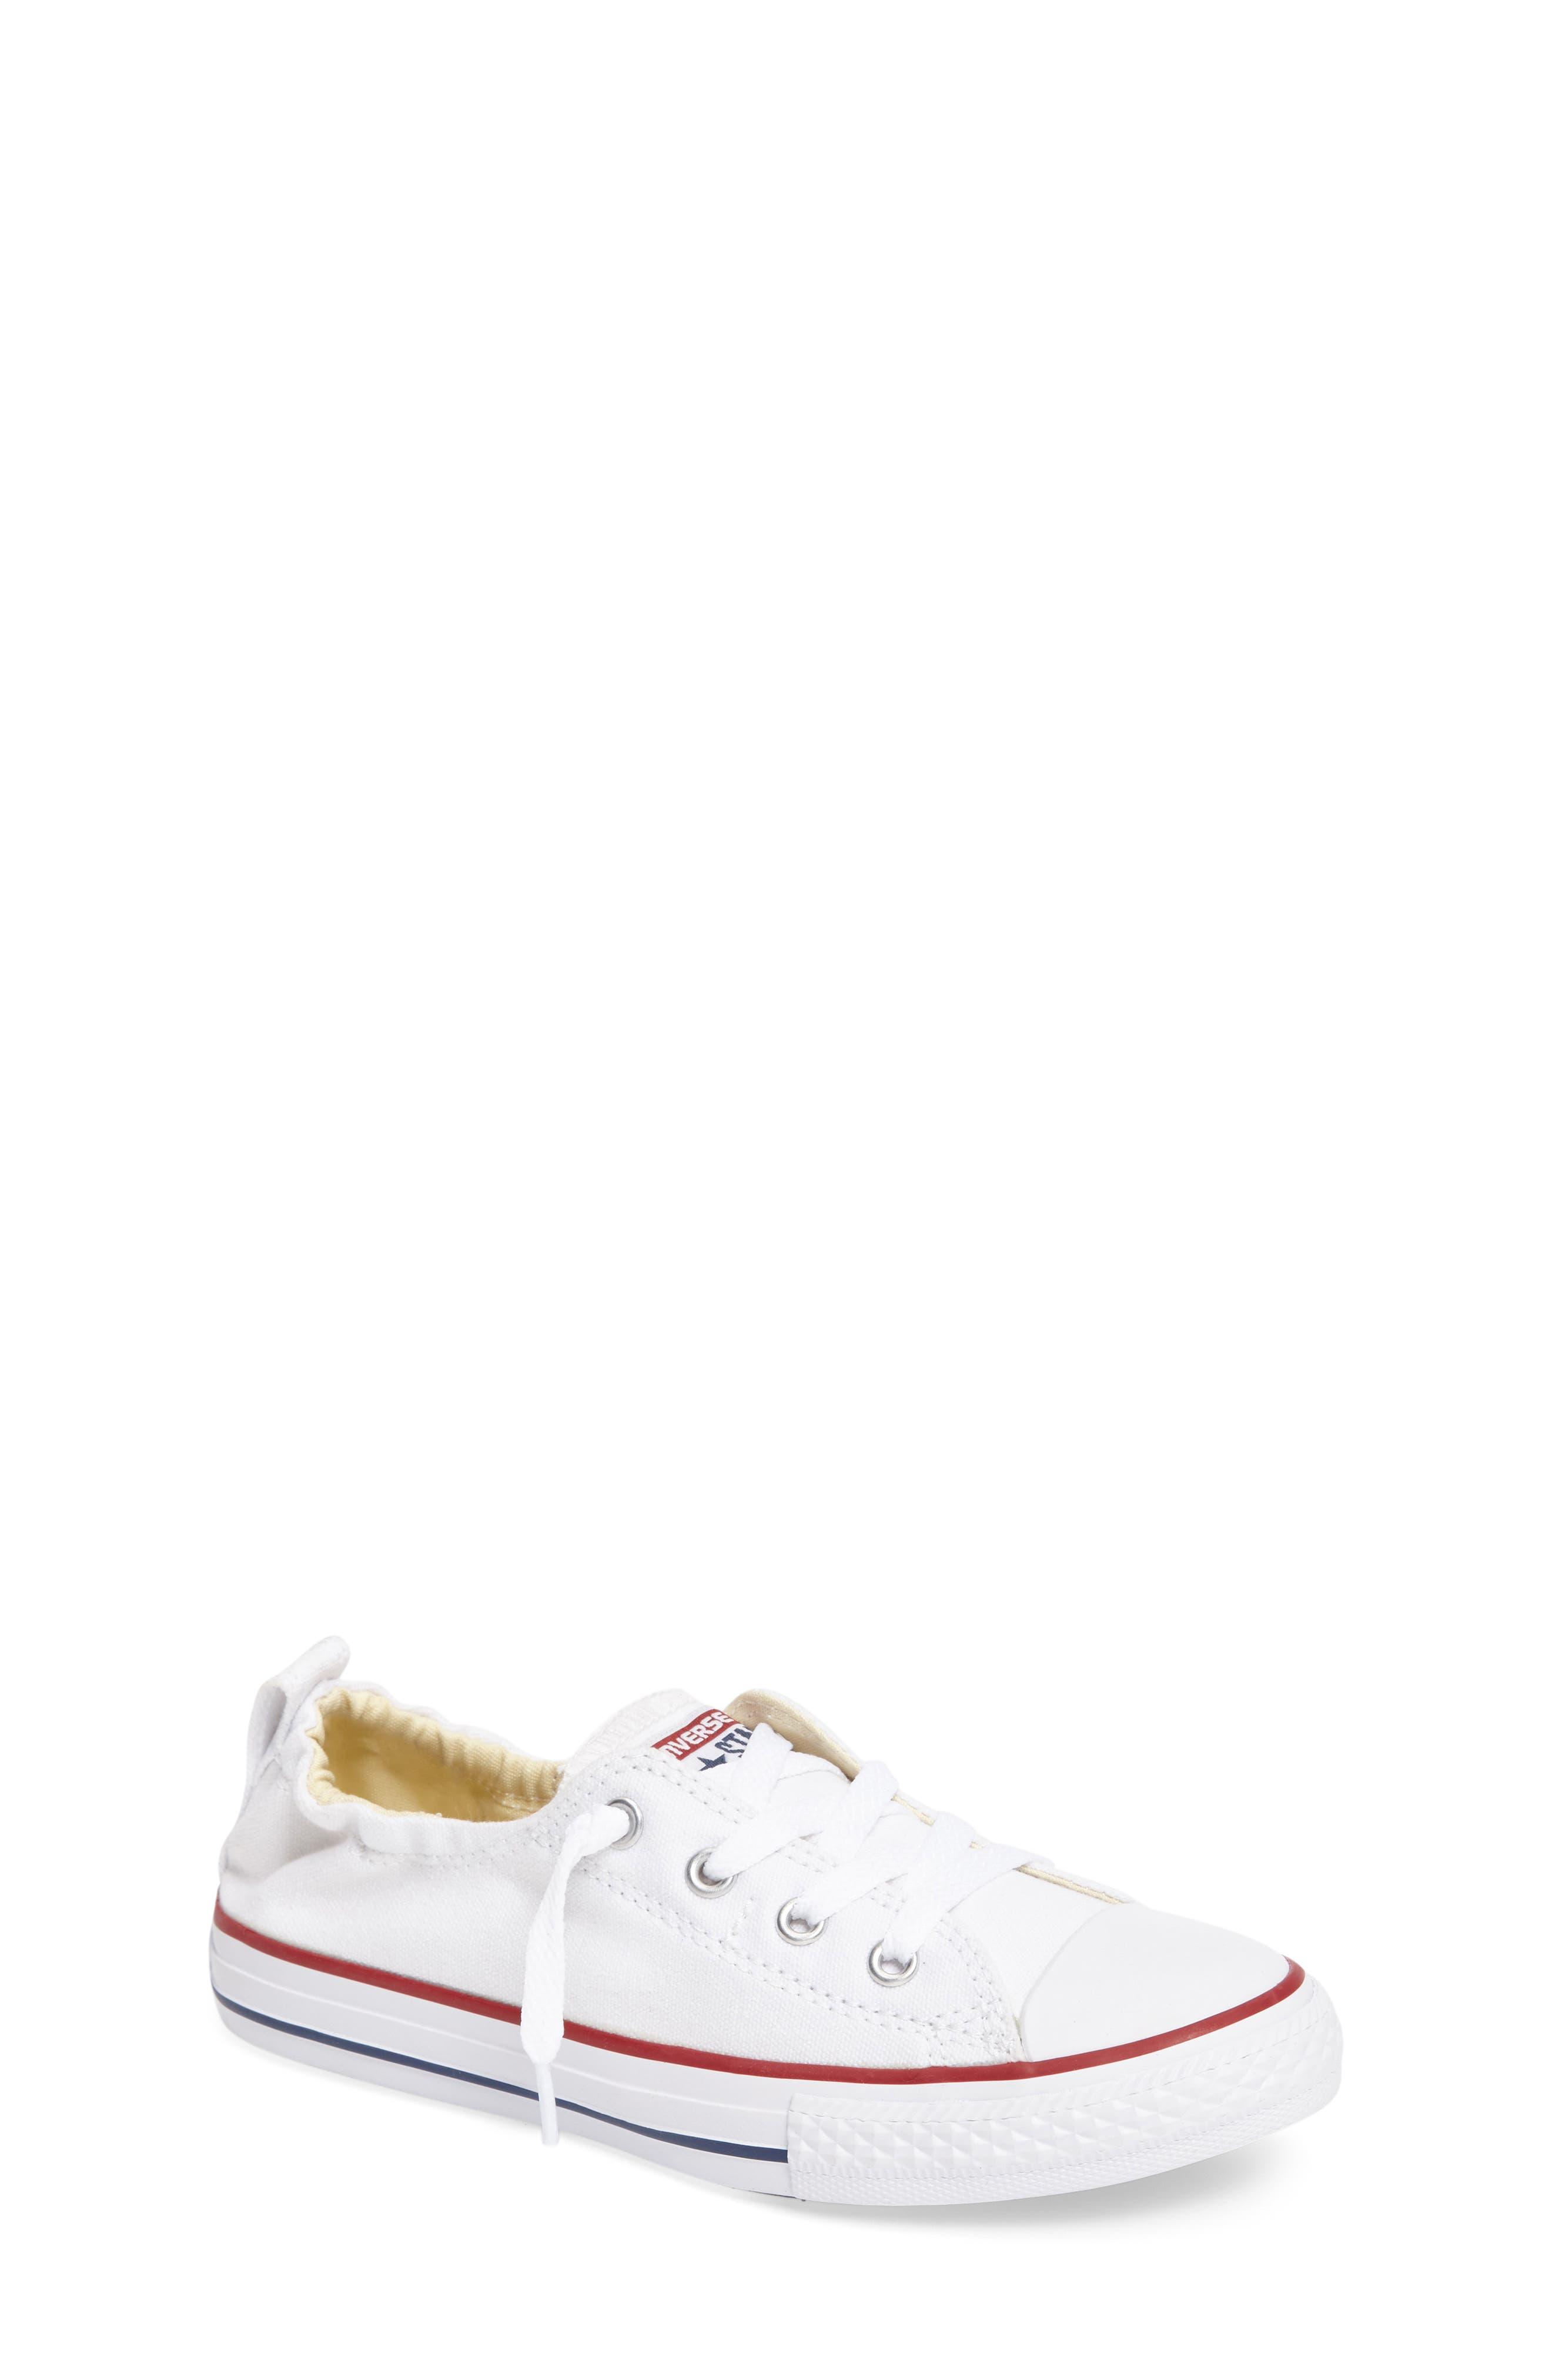 Converse Chuck Taylor® All Star® Shoreline Low Top Sneaker (Toddler, Little Kid & Big Kid)